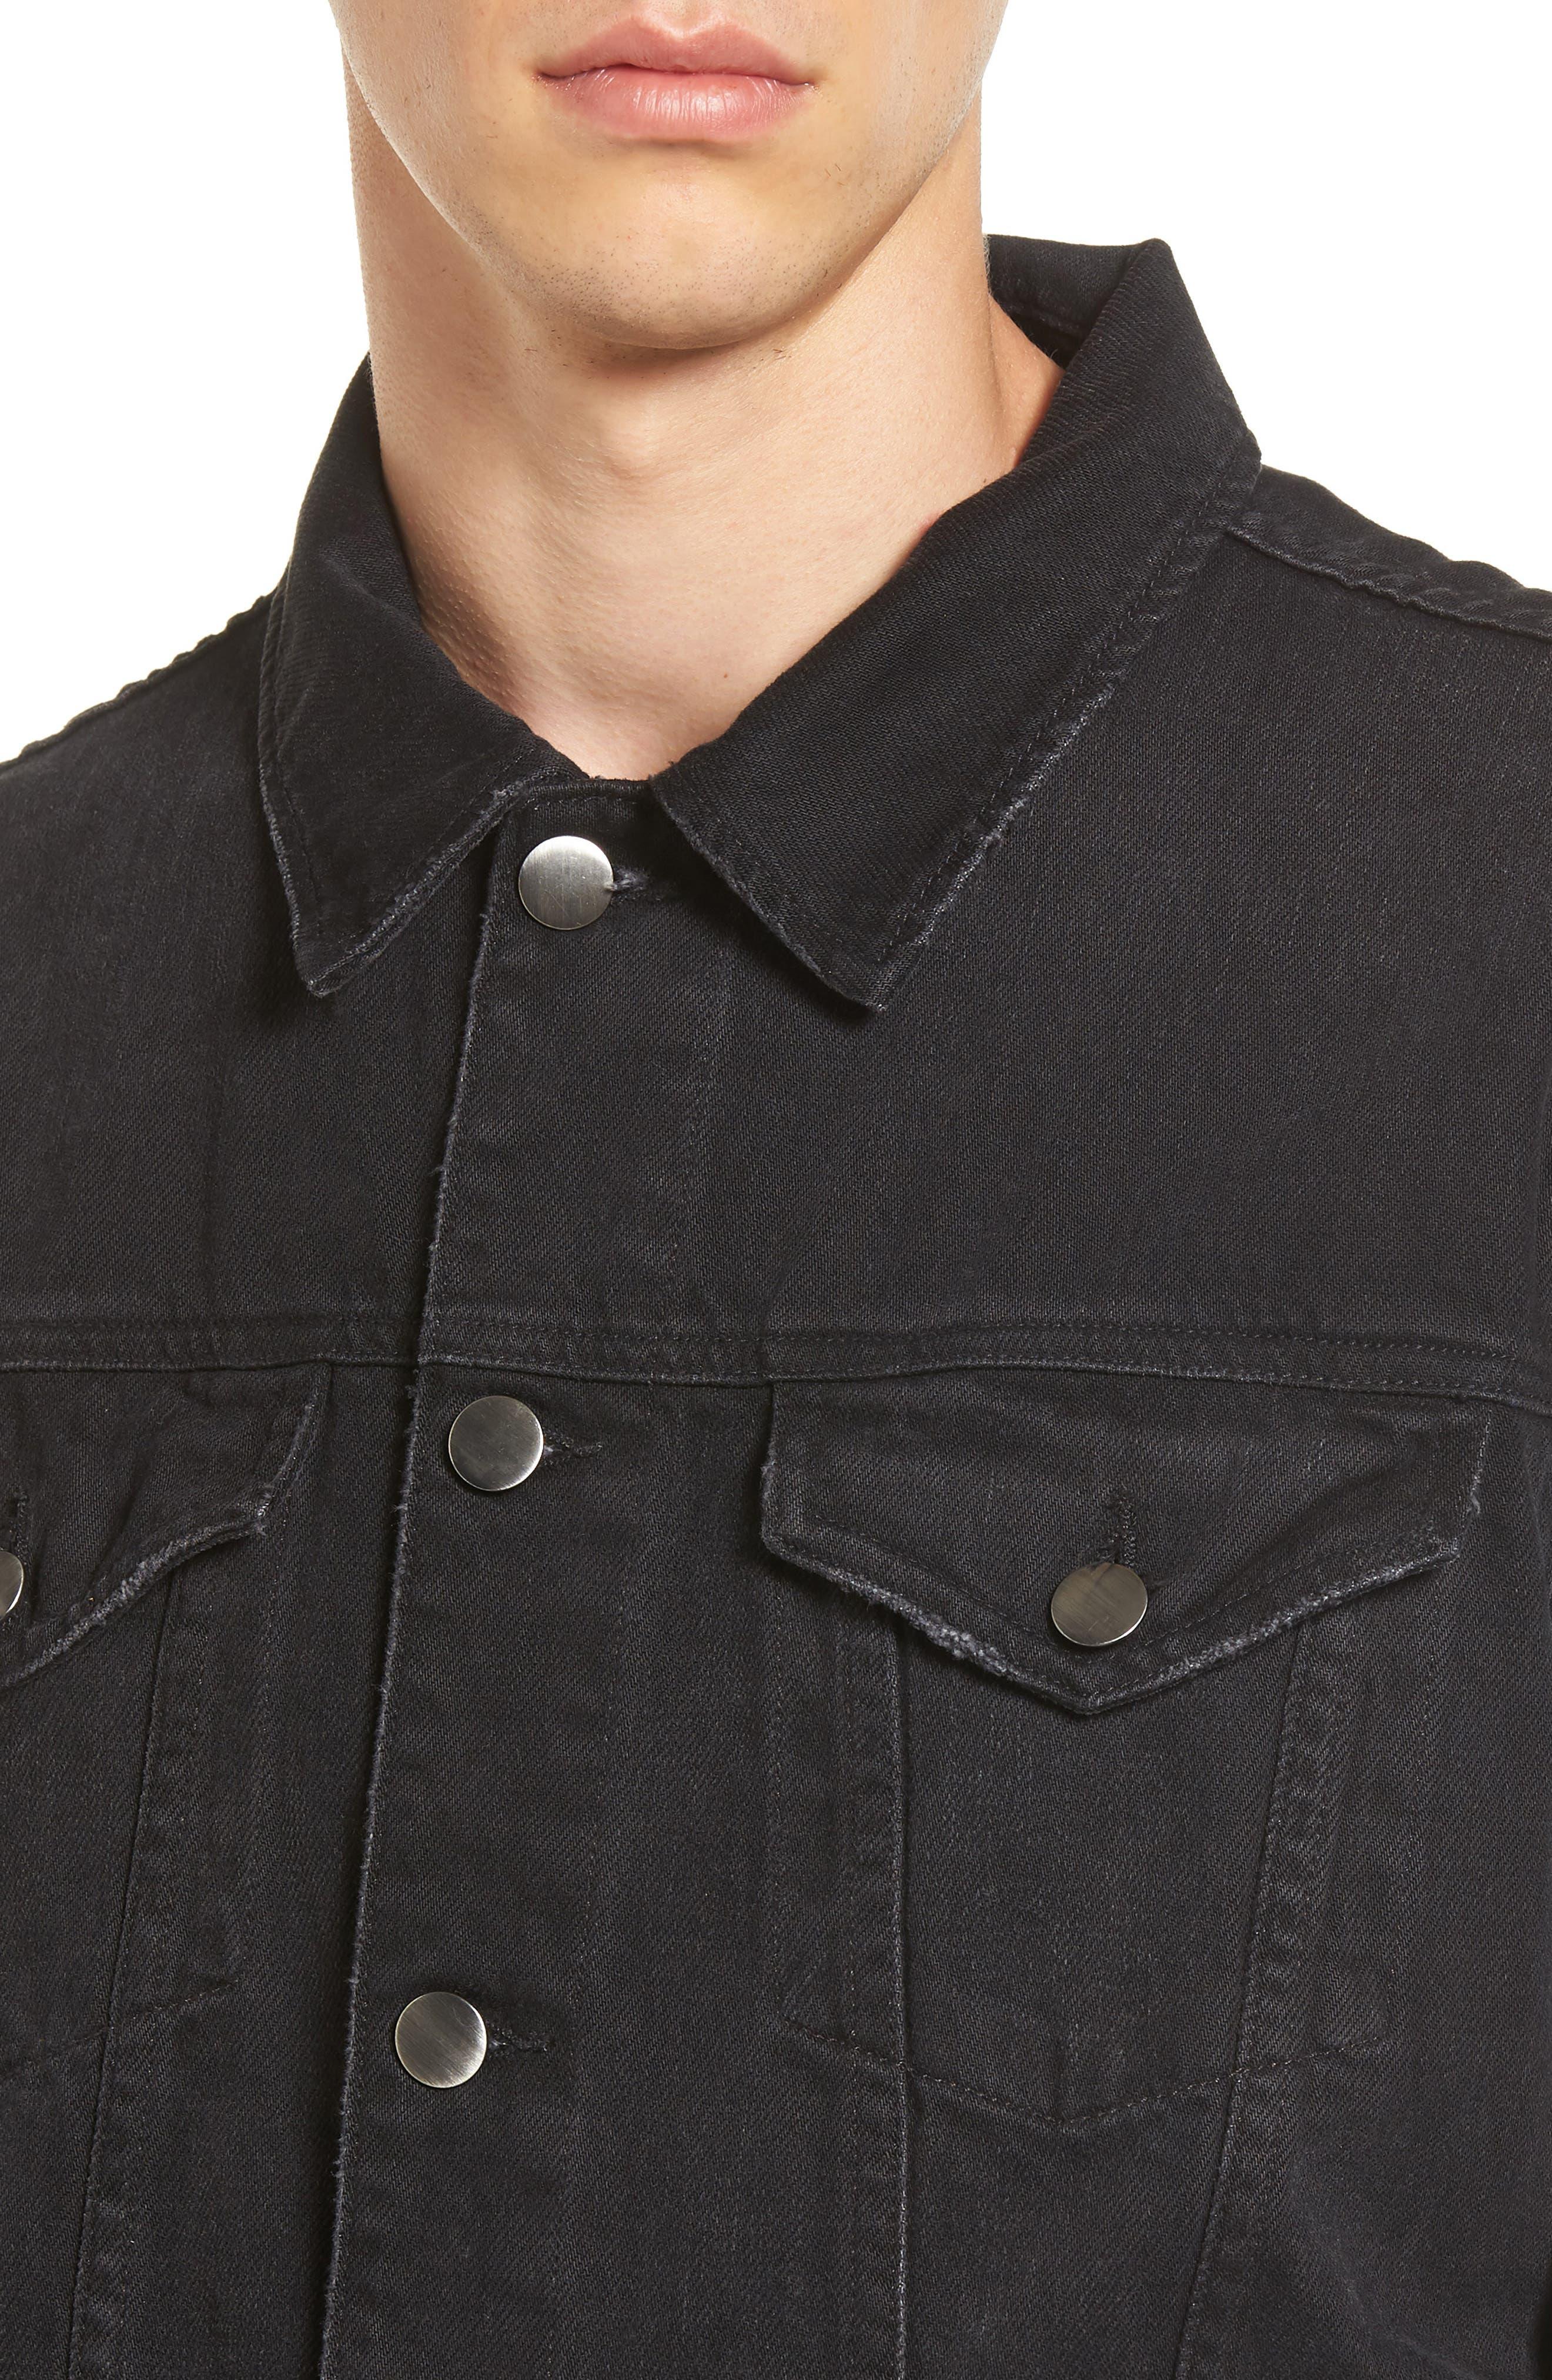 L'Homme Denim Jacket,                             Alternate thumbnail 4, color,                             001